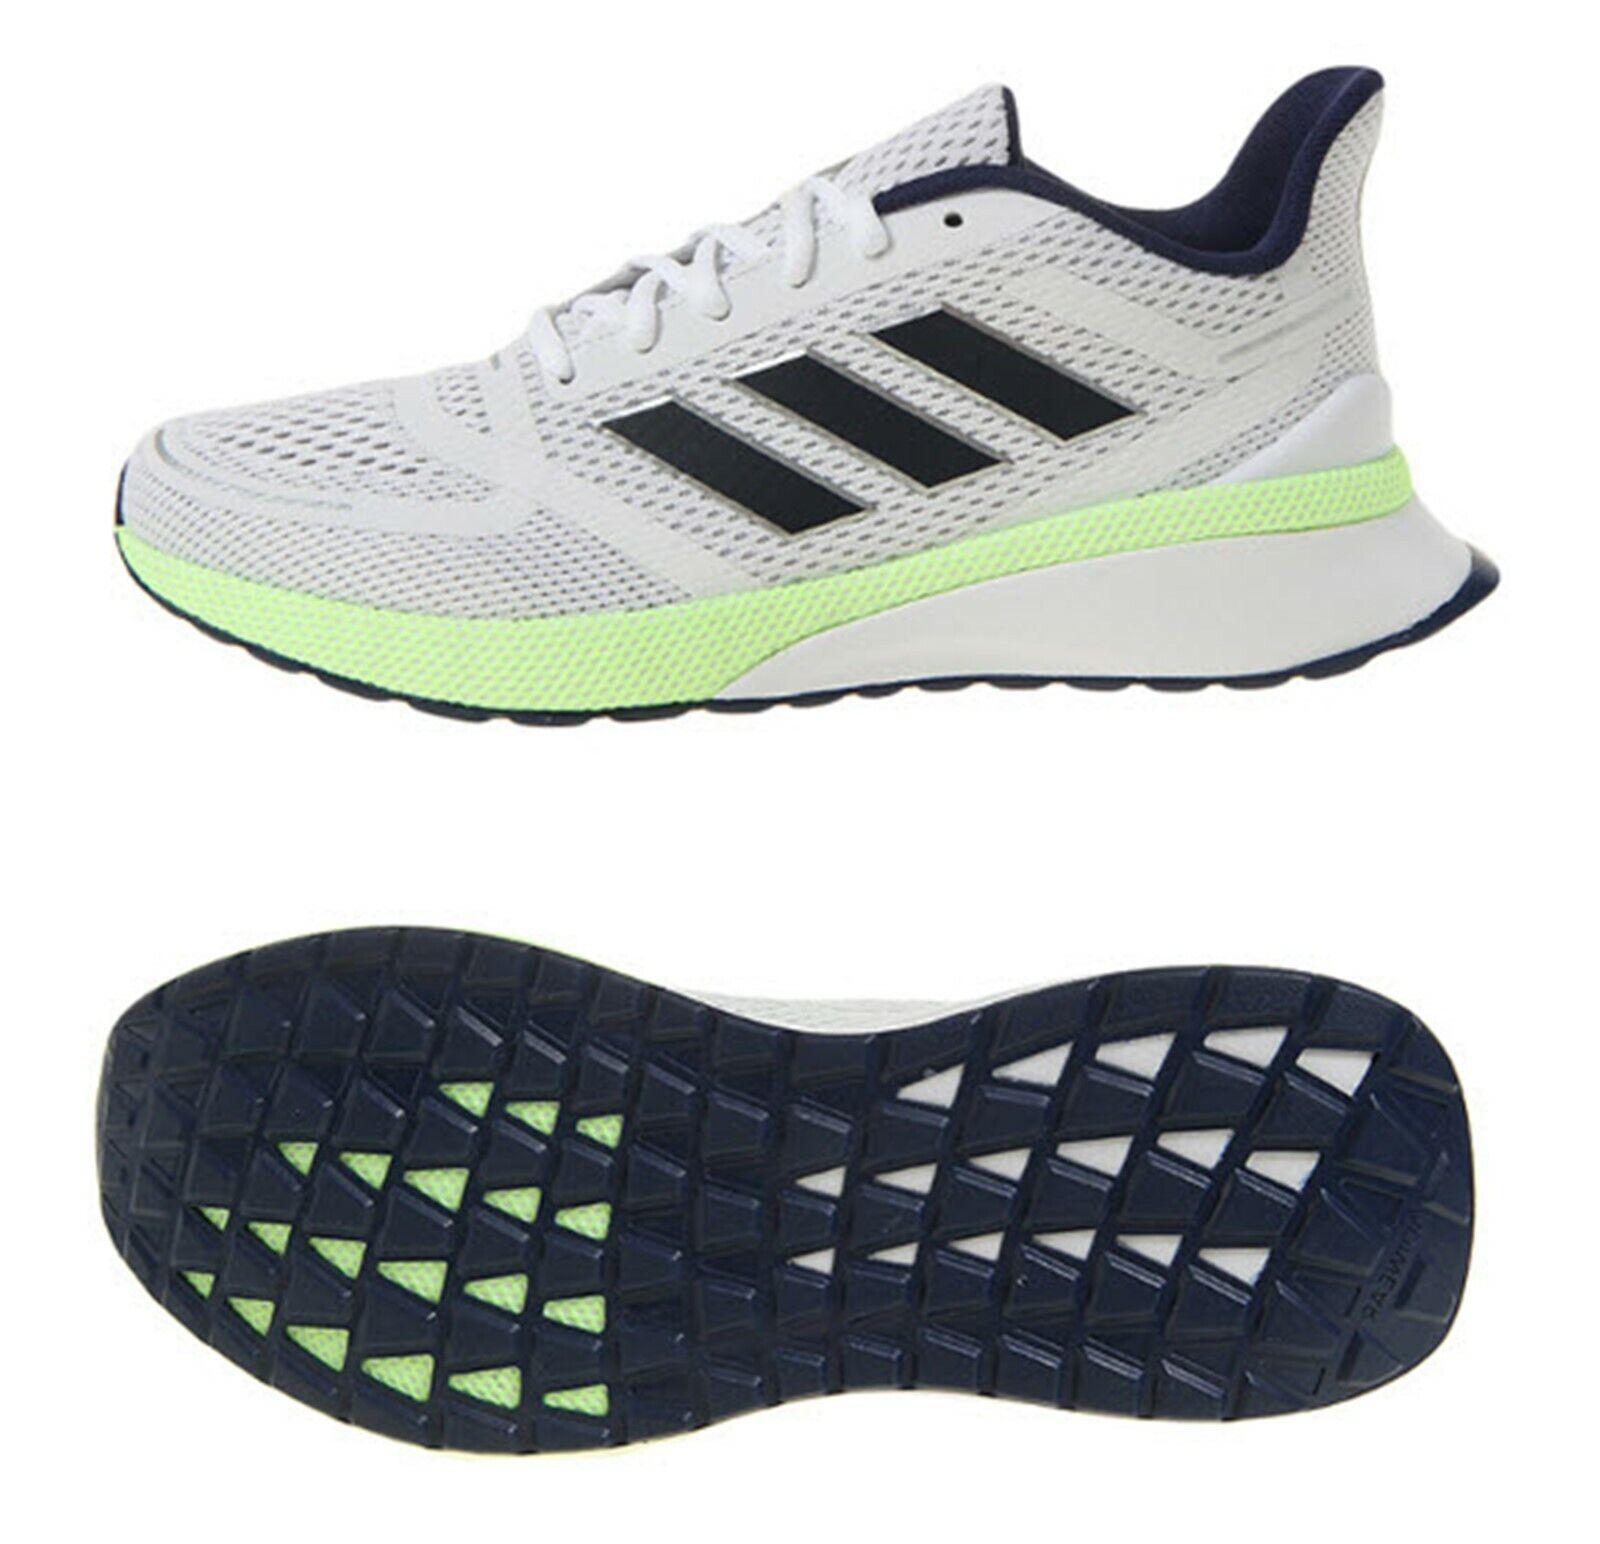 Adidas Men NOVA FVSE Run Shoes Running White Sneakers Casual Boot Shoe EE9261